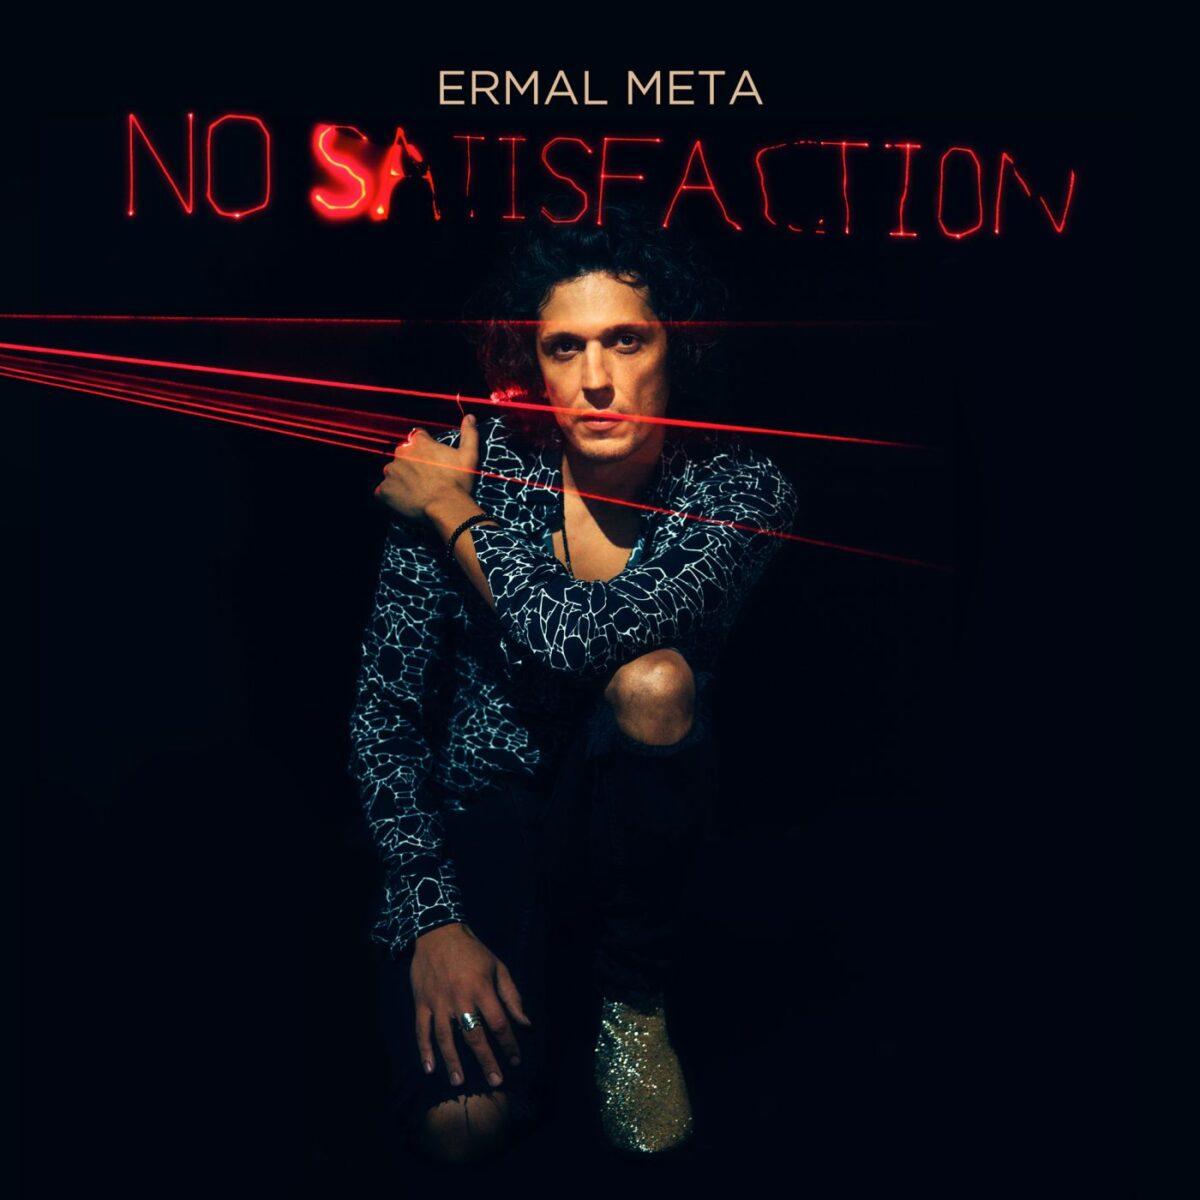 ERMALMETA-nosatisfaction-bassa